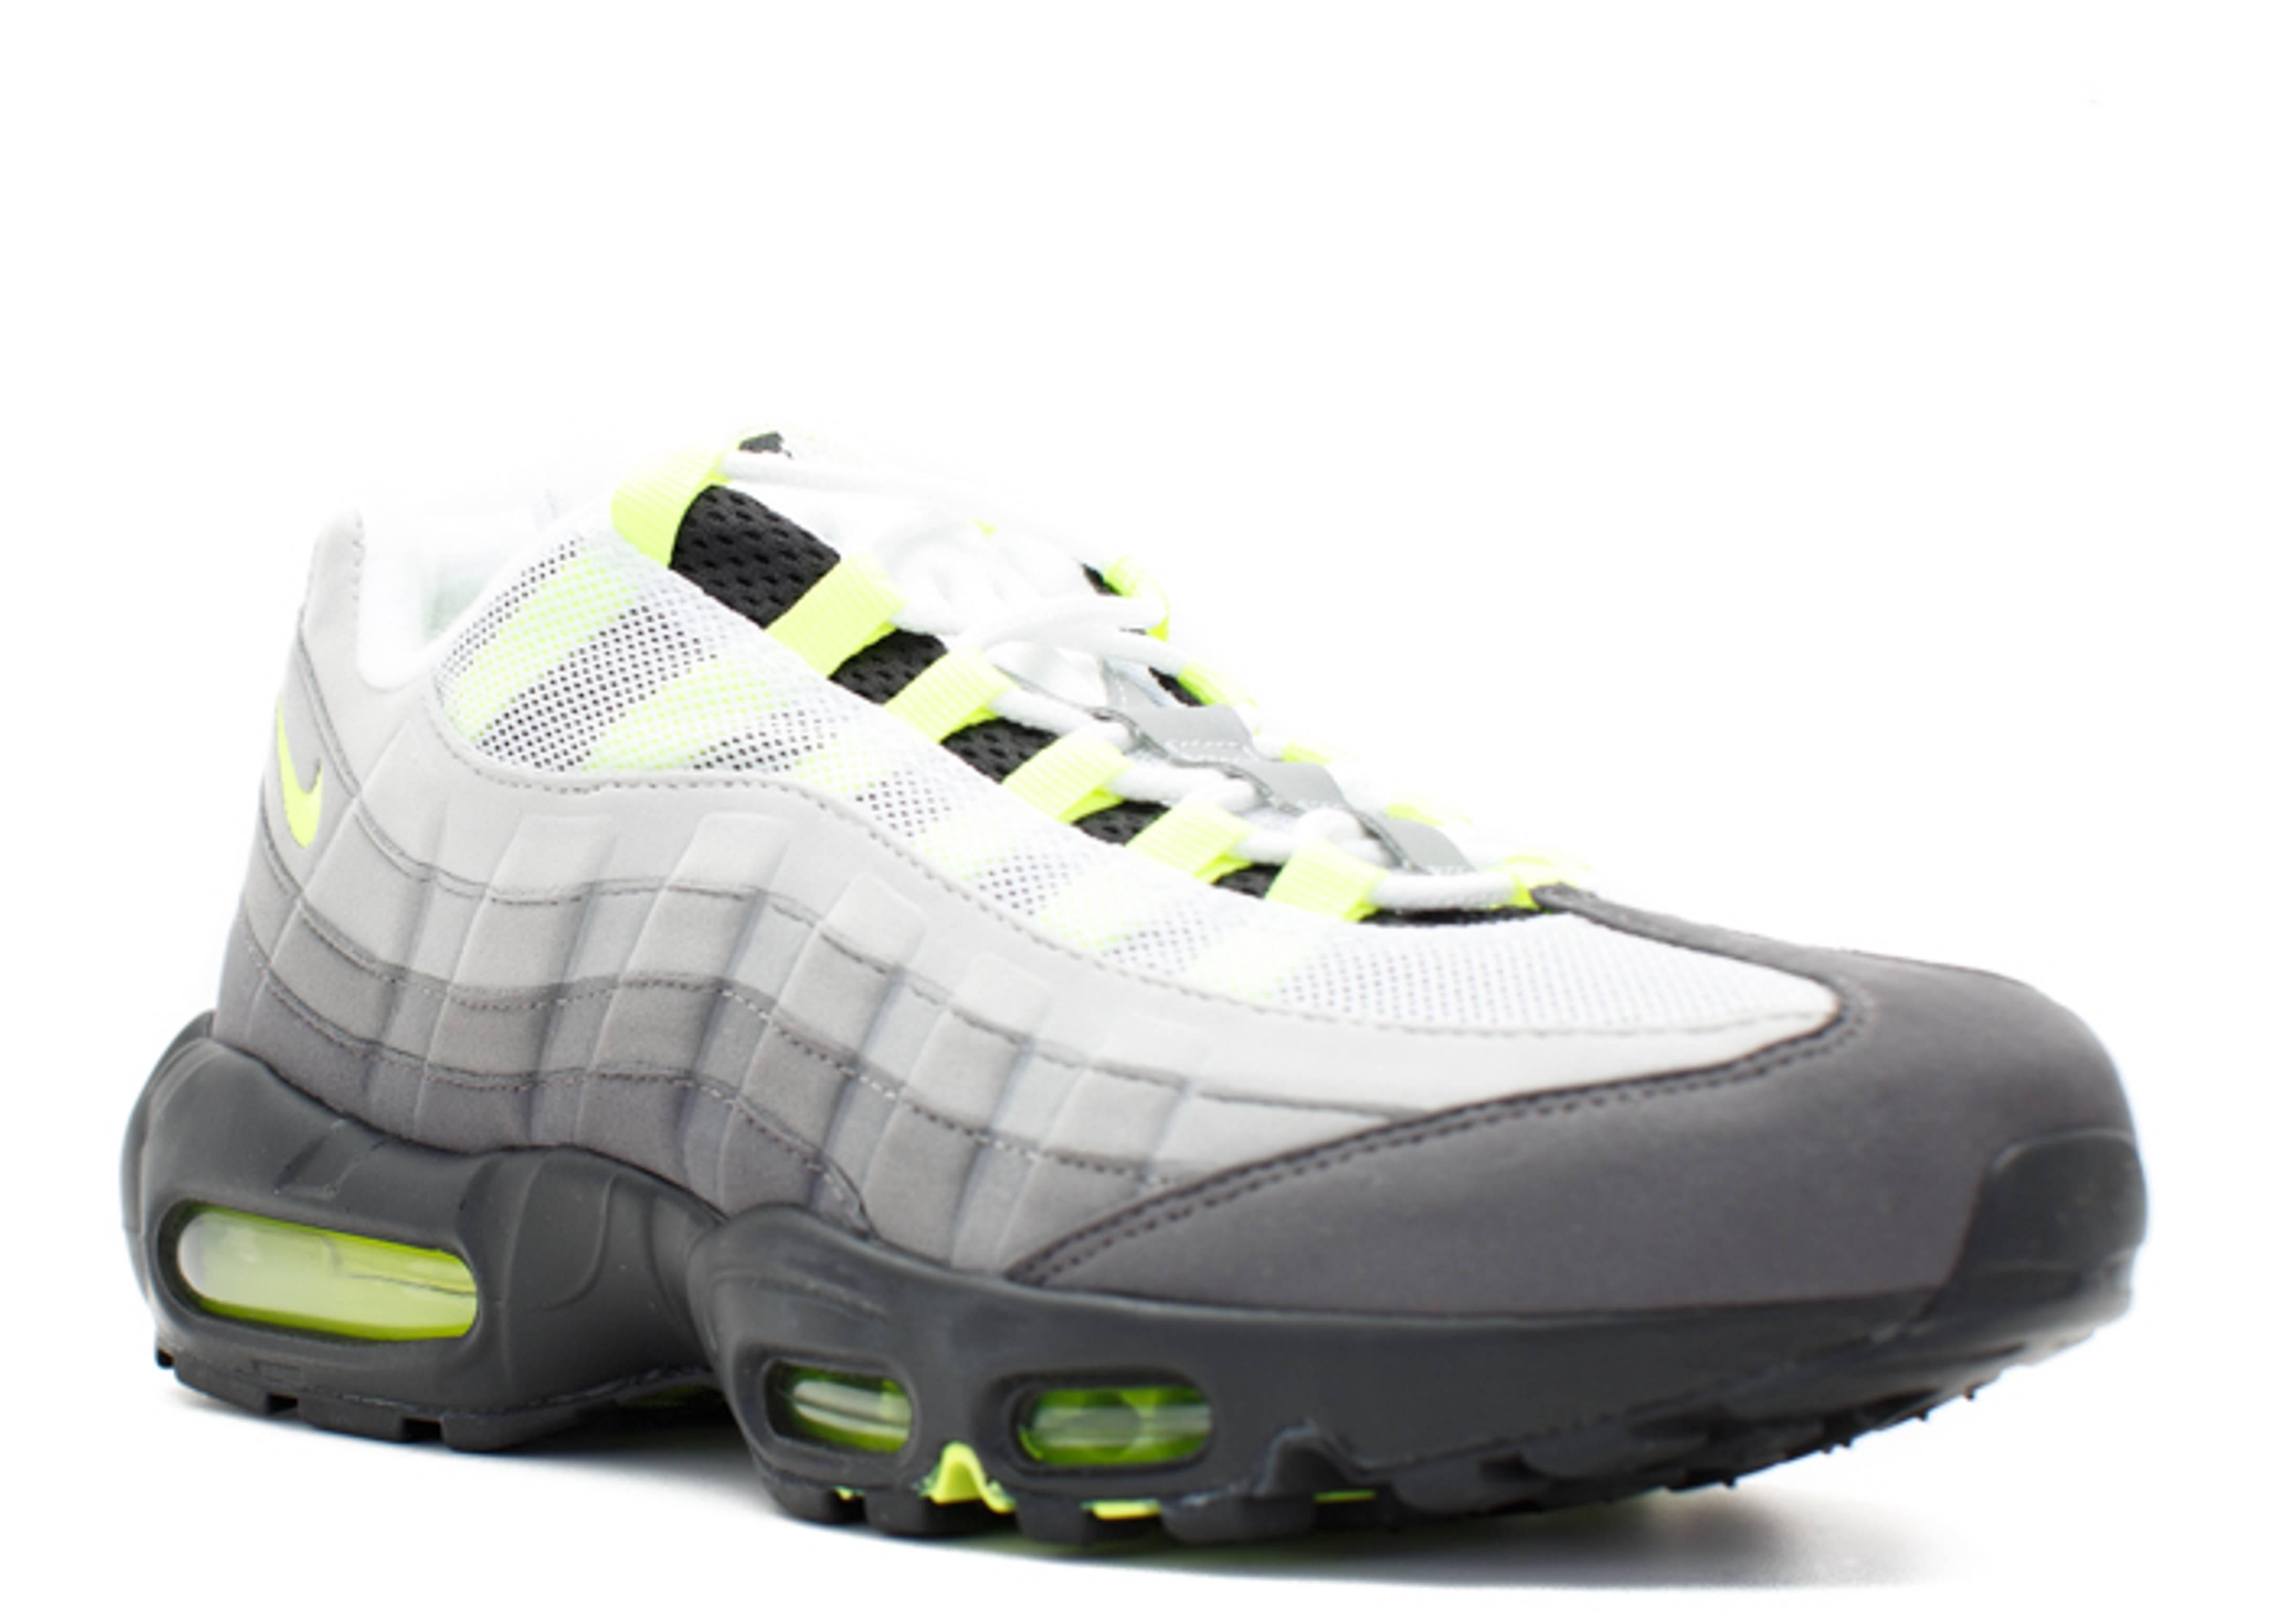 Nike Air Max 95 Og